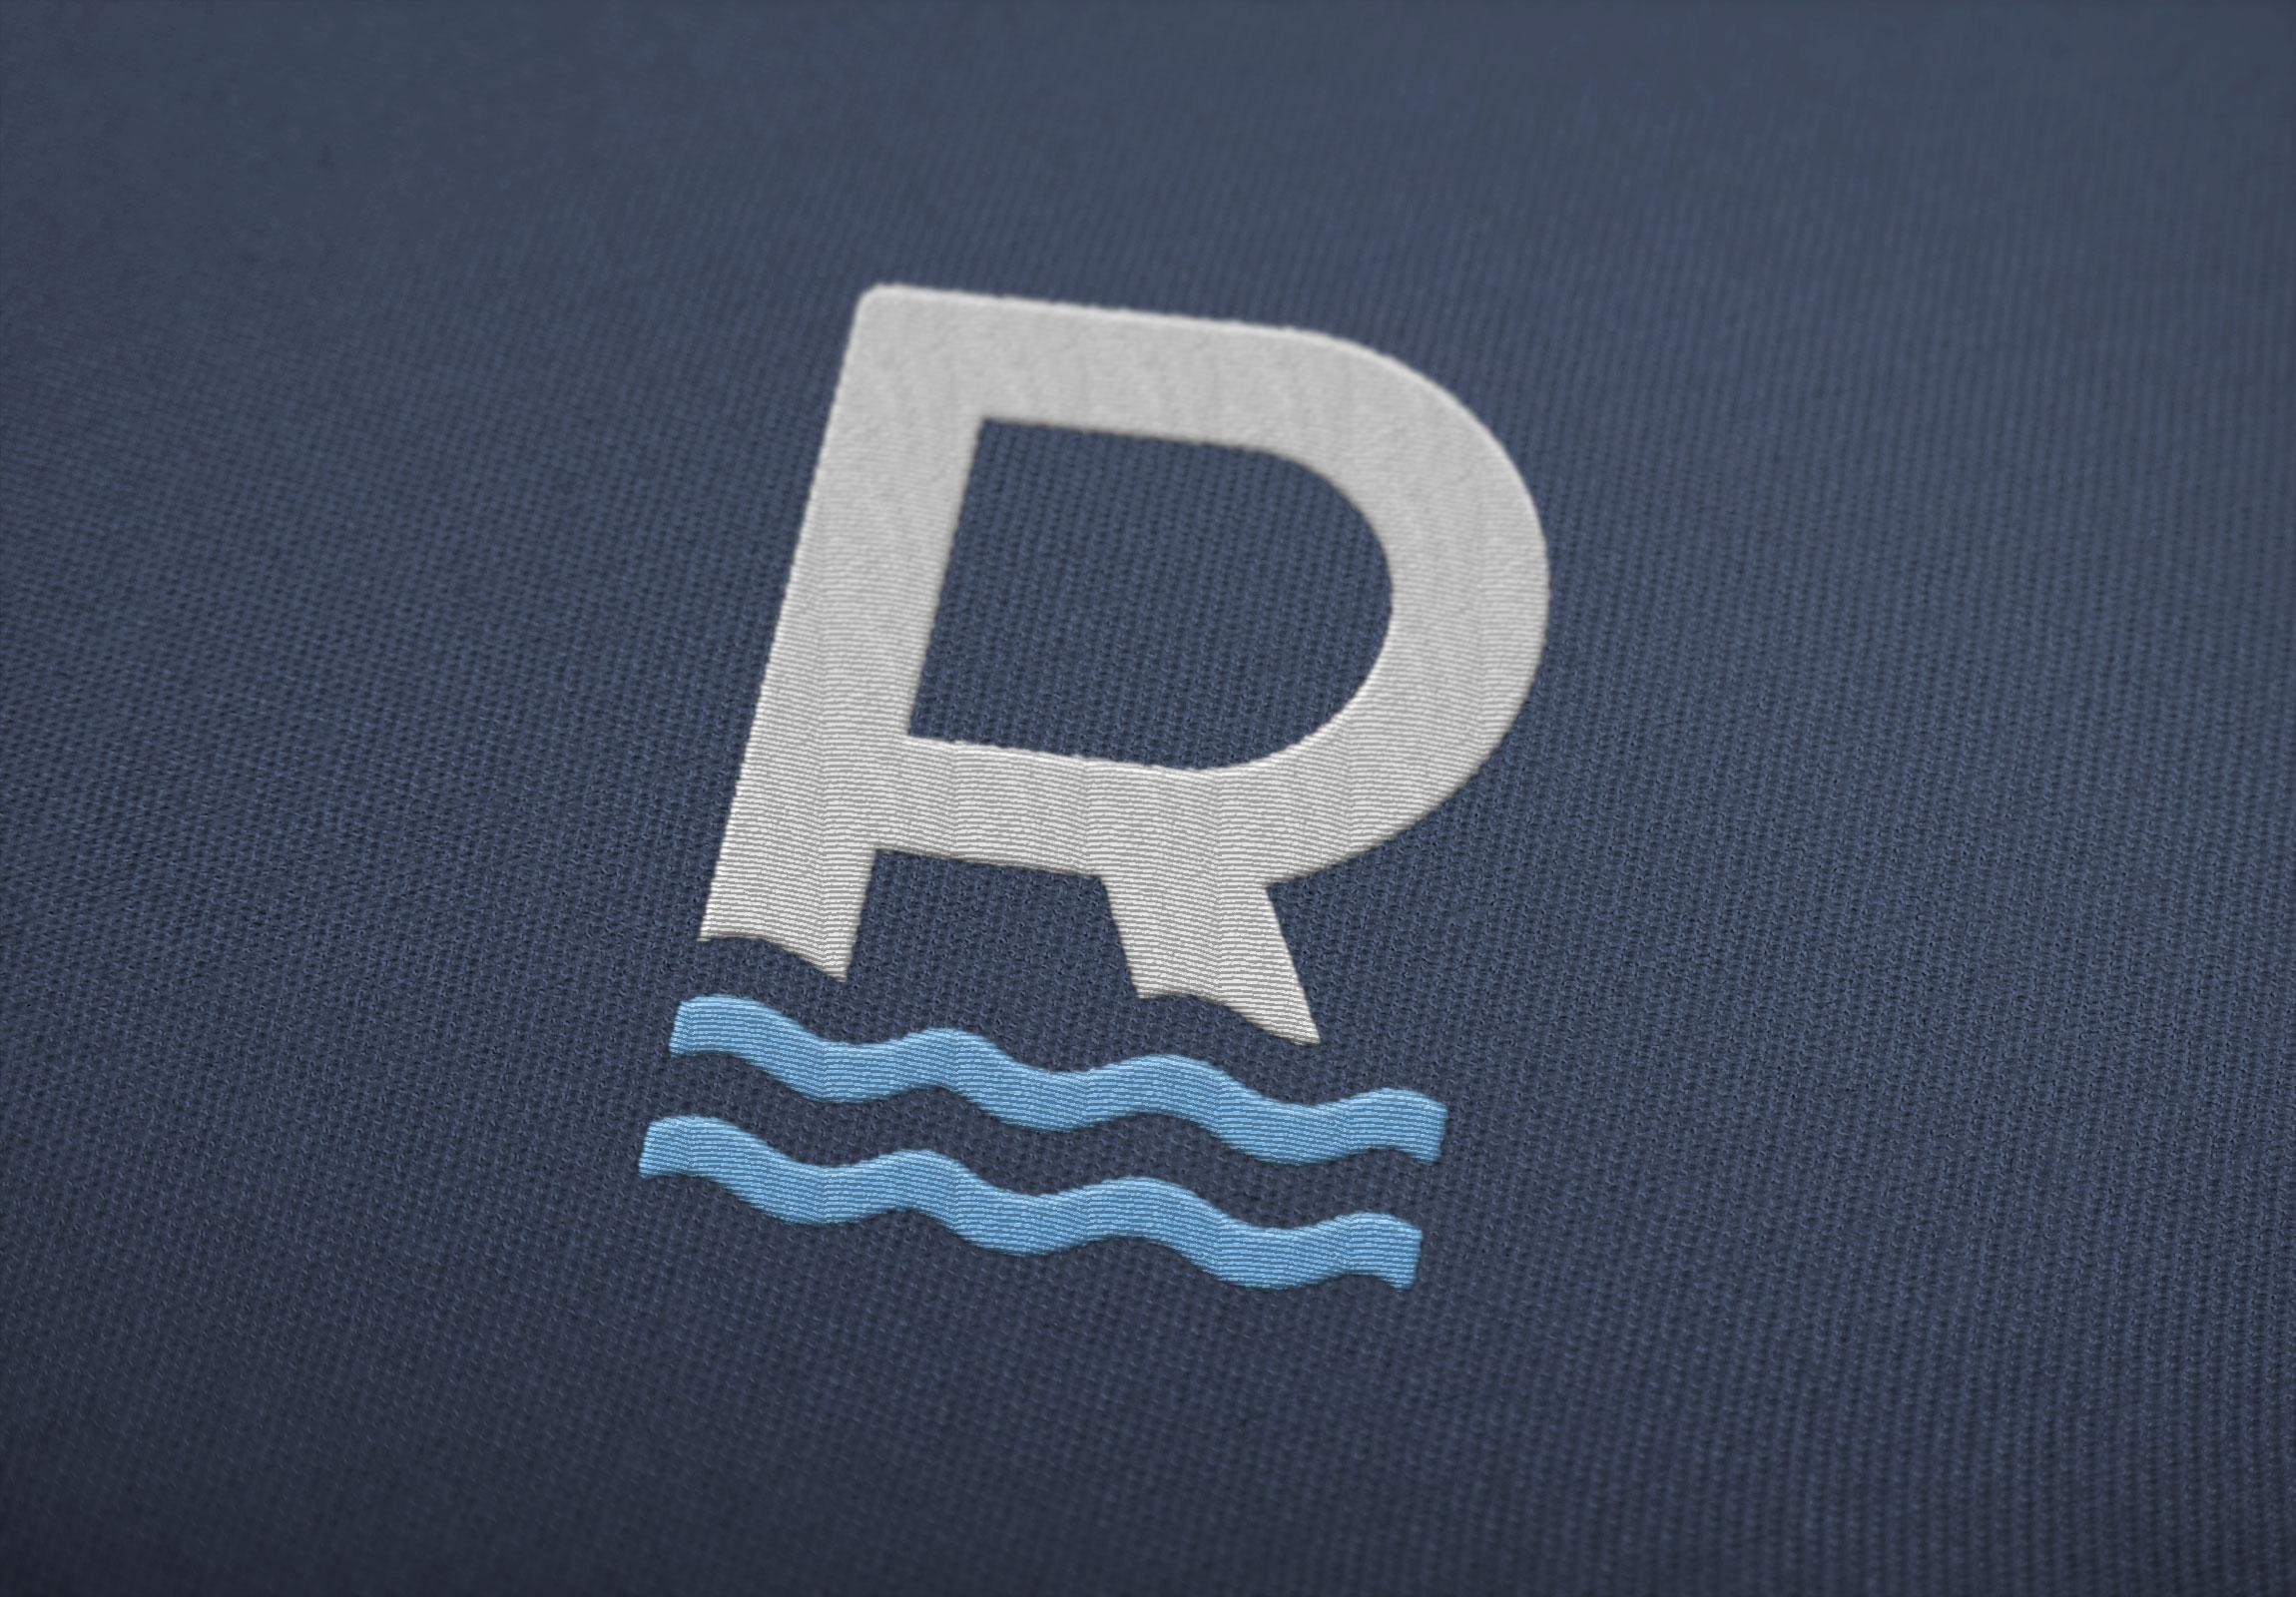 RHARBOR - Logo Stitched